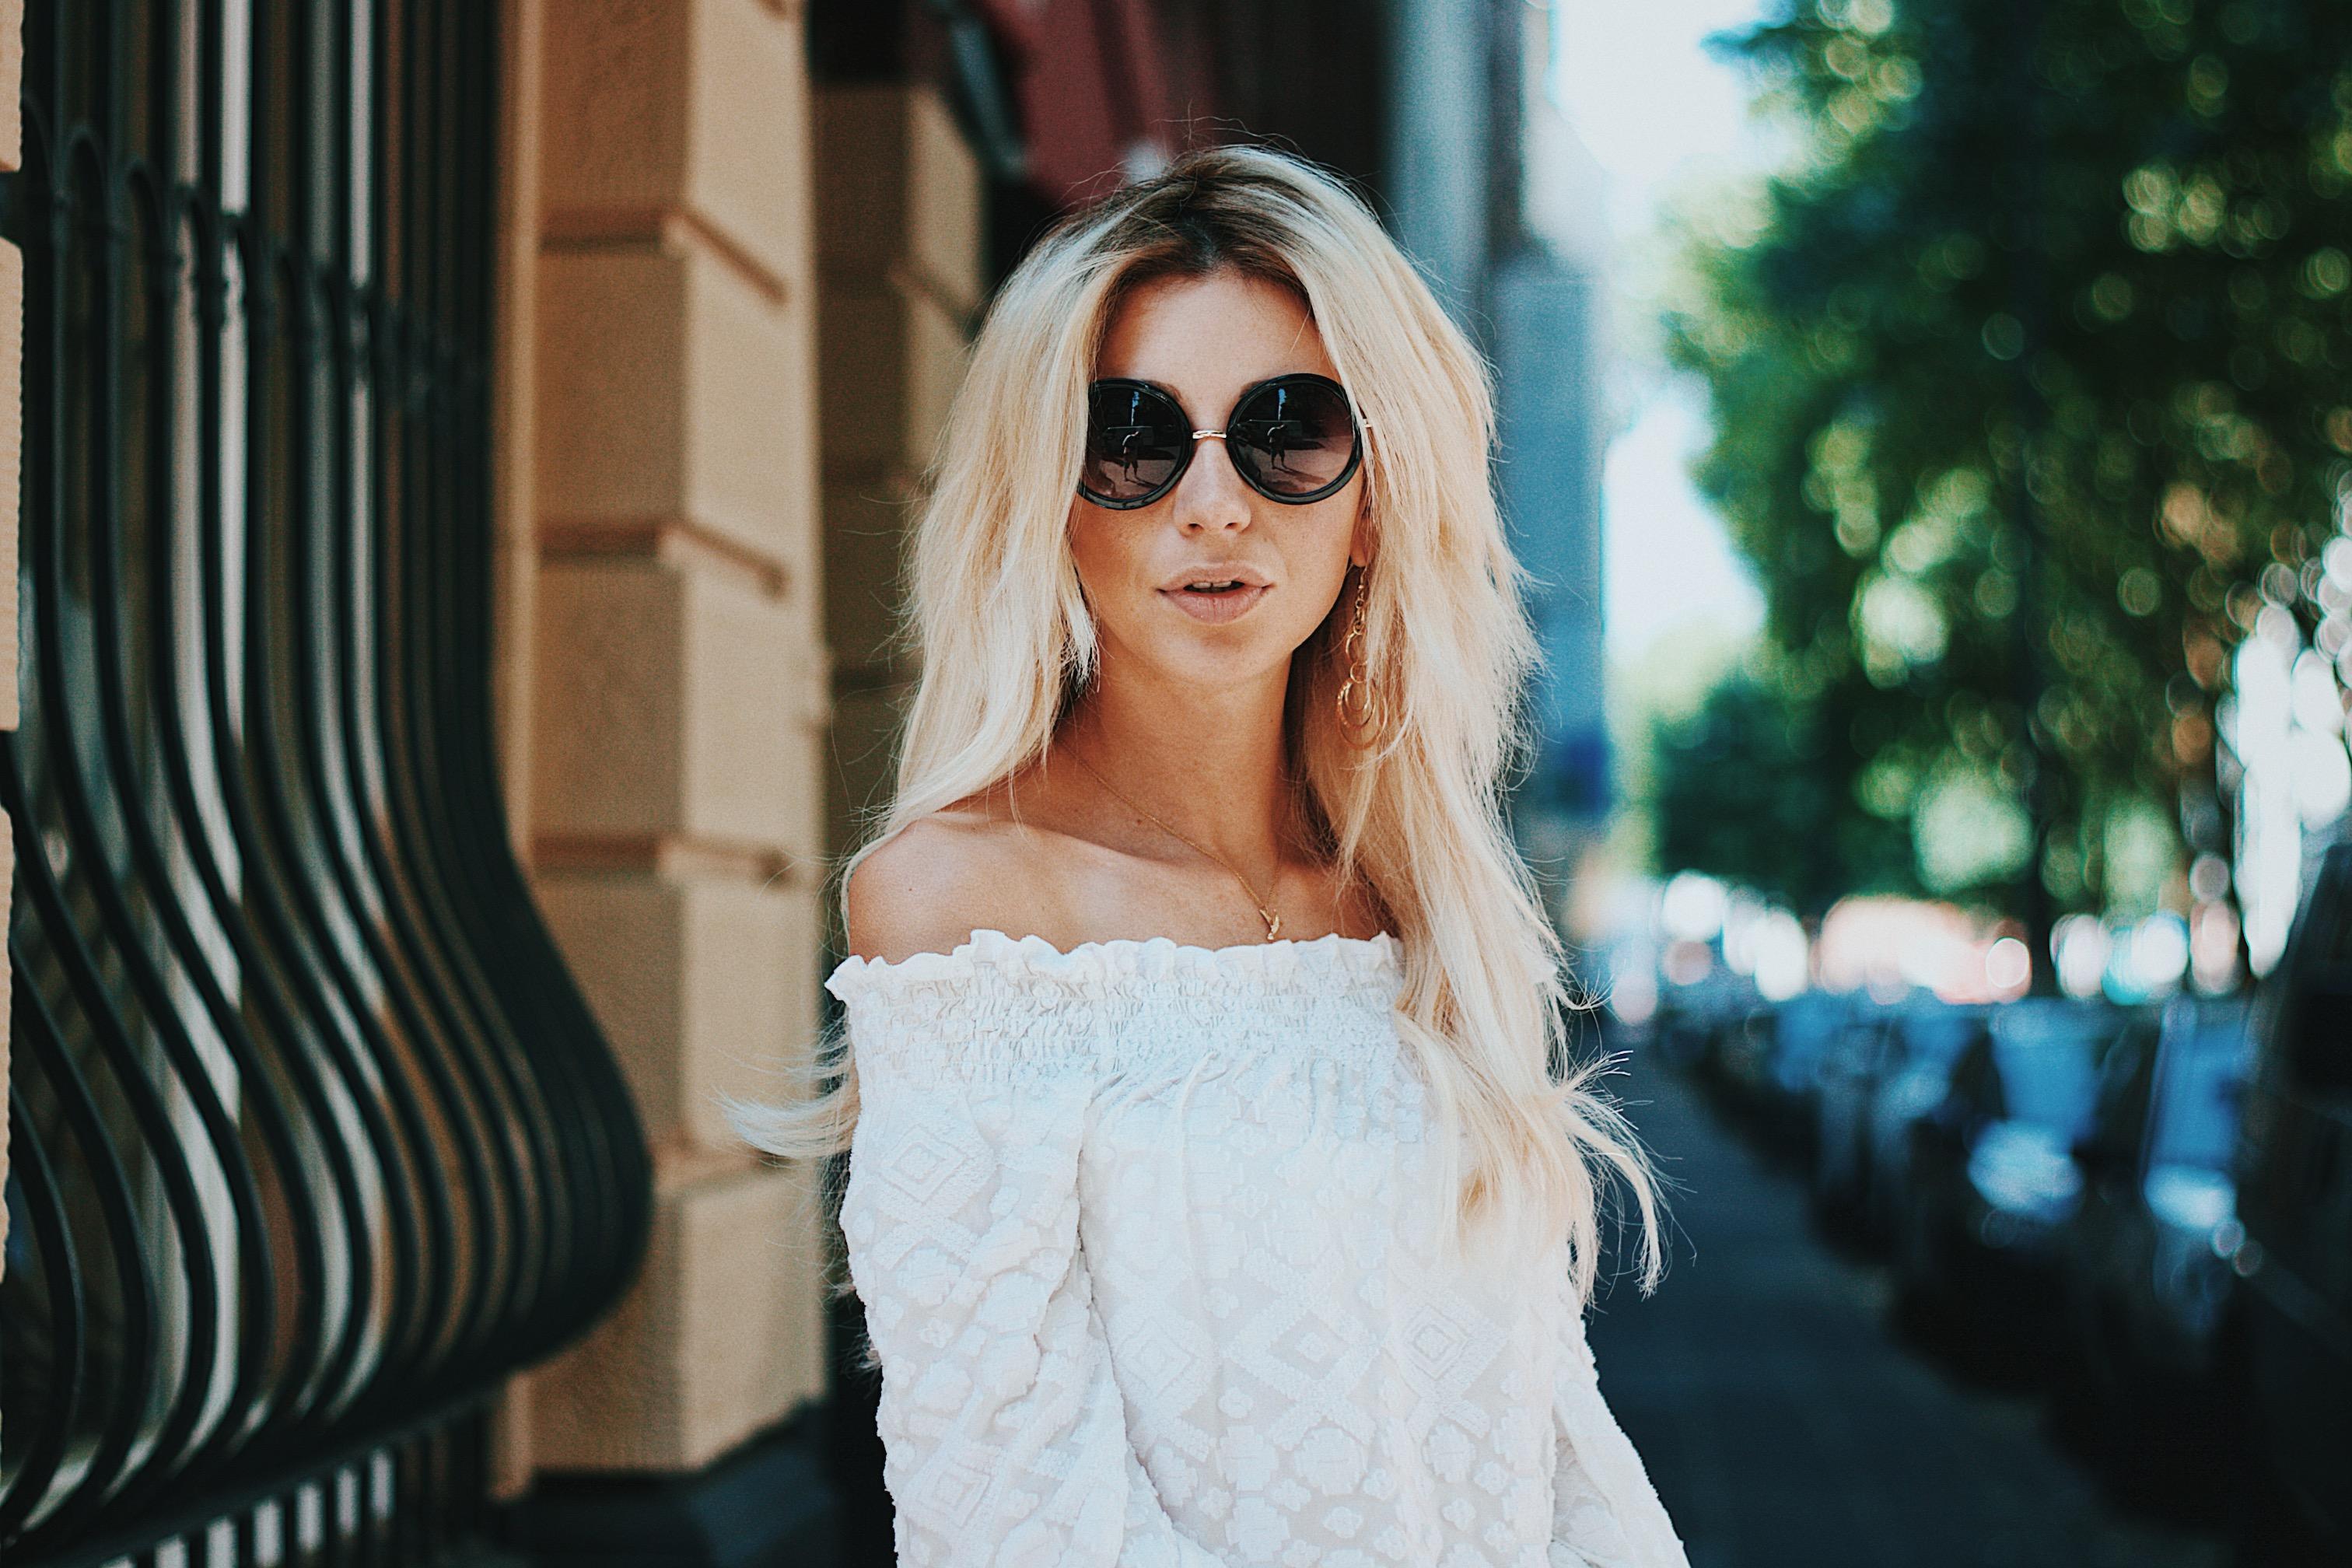 vsco-blogger-instagram-filter-desktop-presets